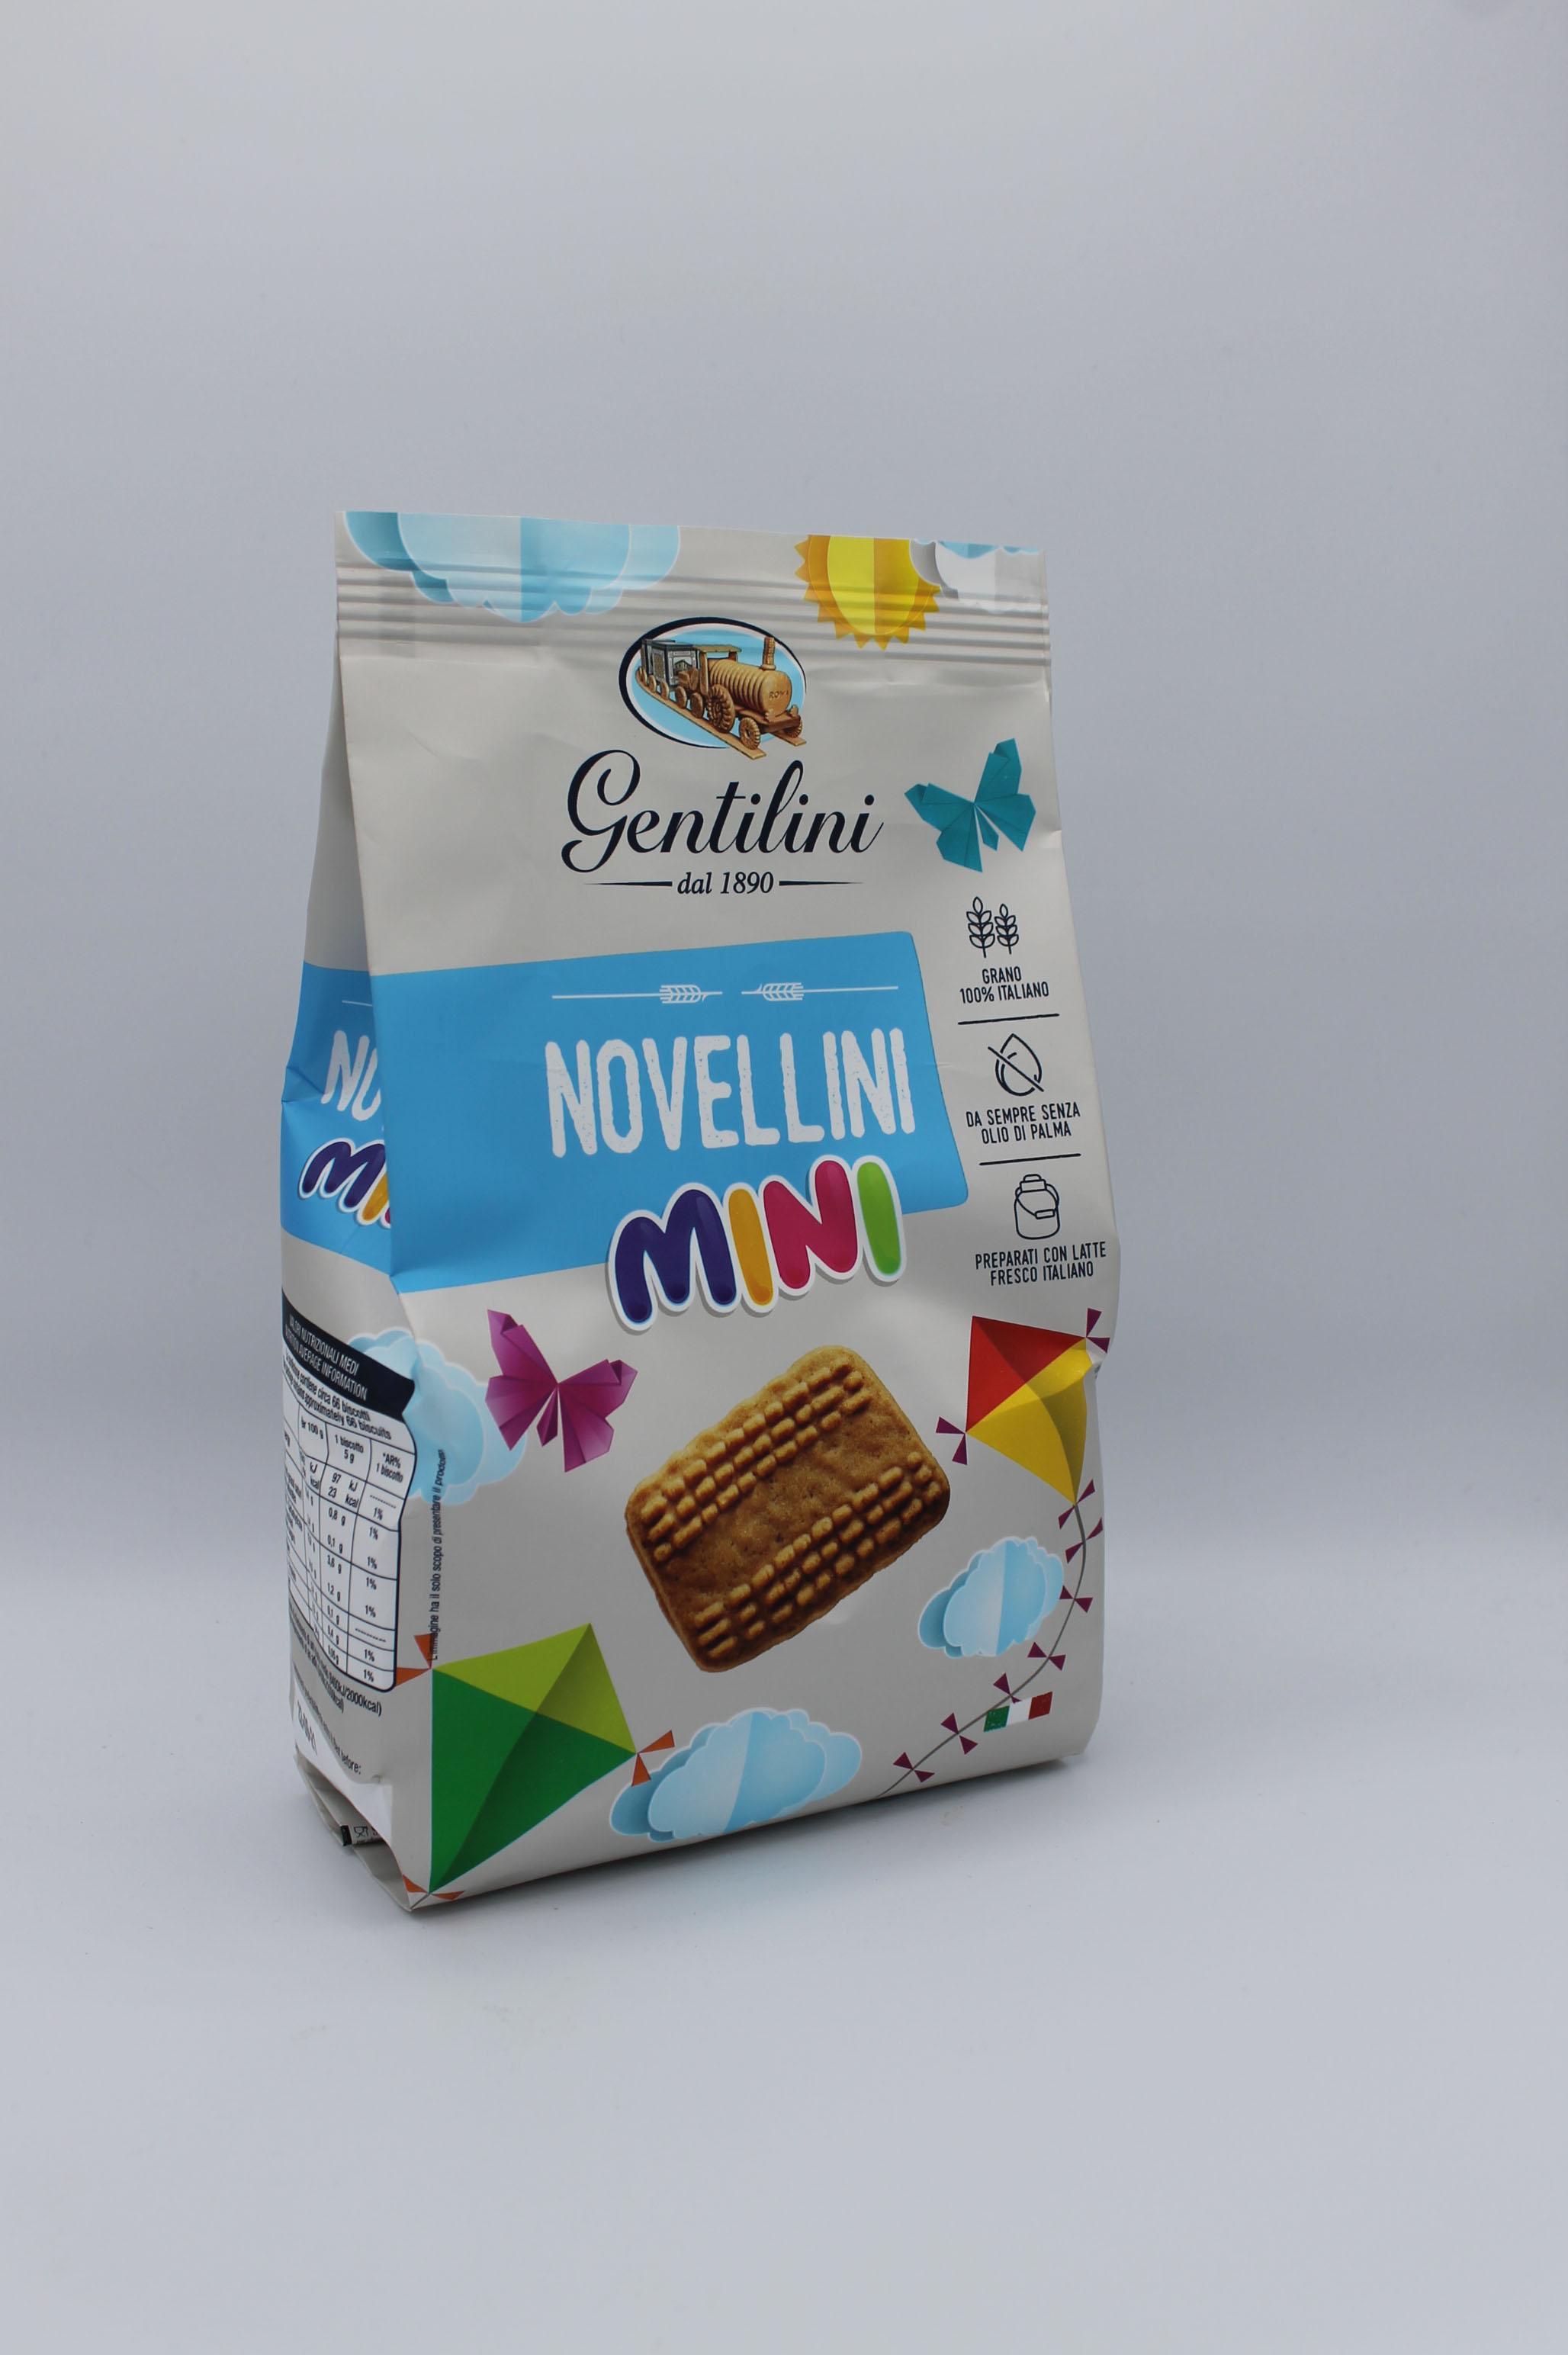 Gentilini novellini/osvego mini 330 gr.